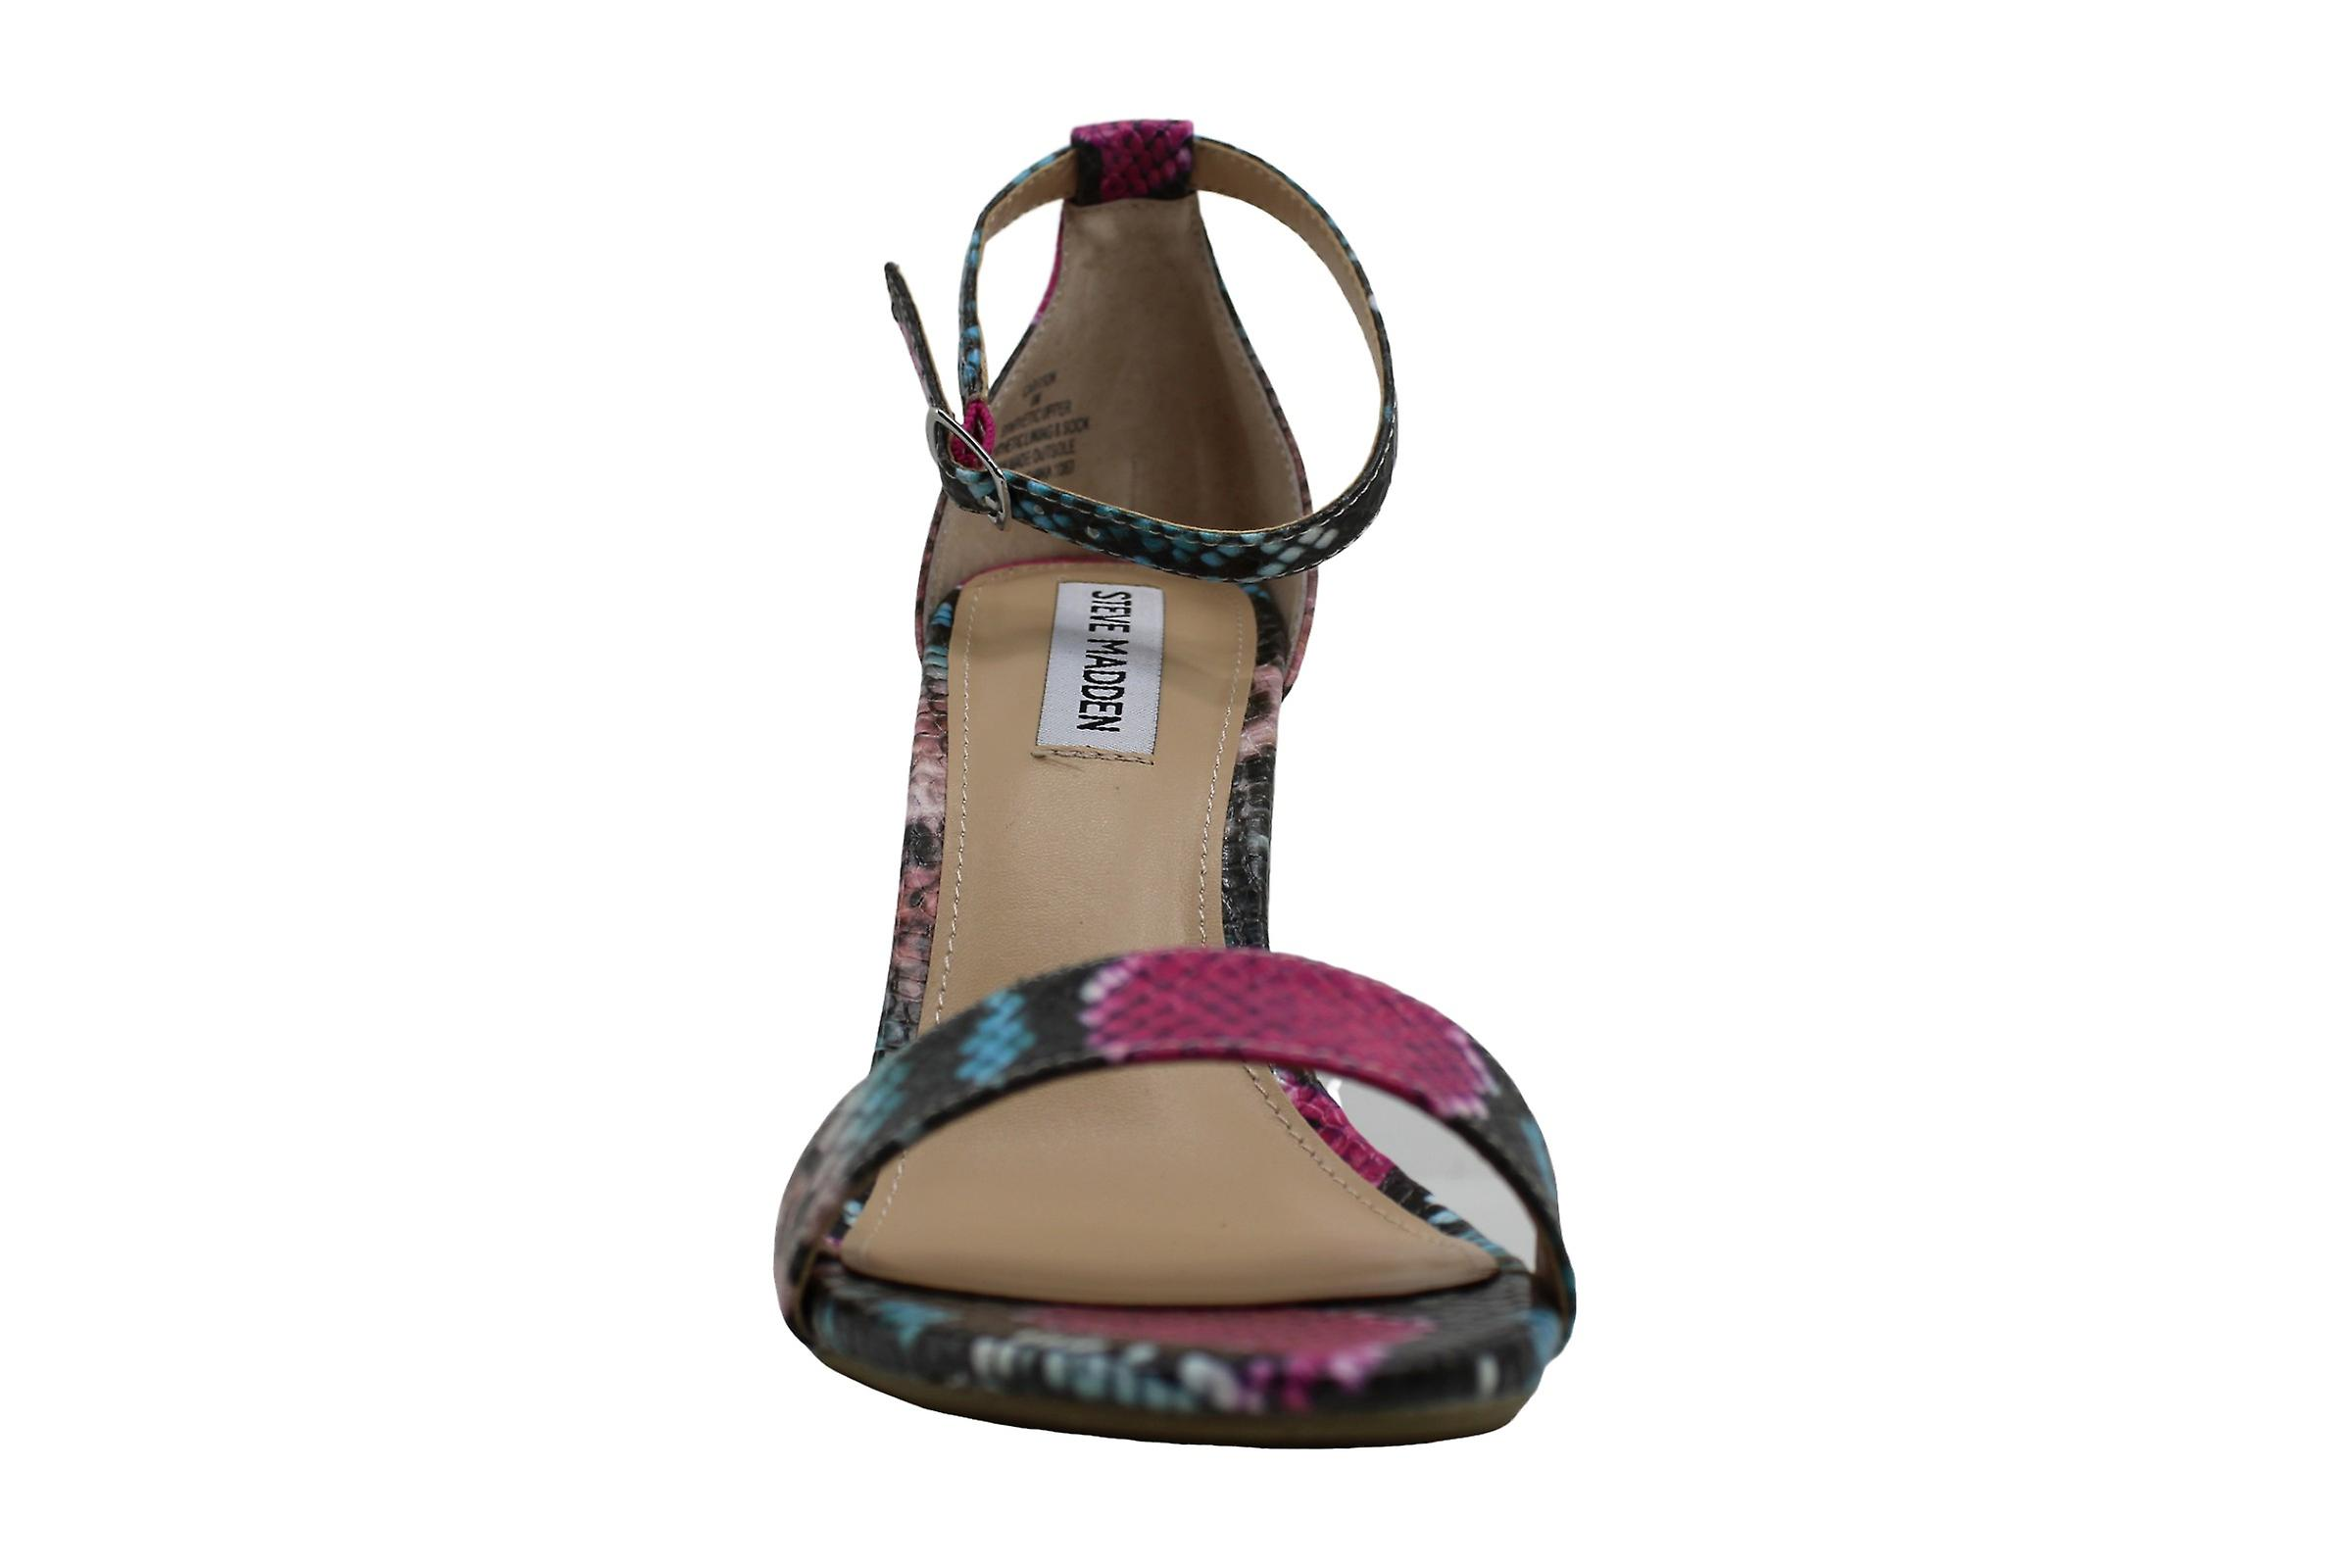 Steve Madden Femmes Carrson Peep Toe Casual Ankle Strap Sandales